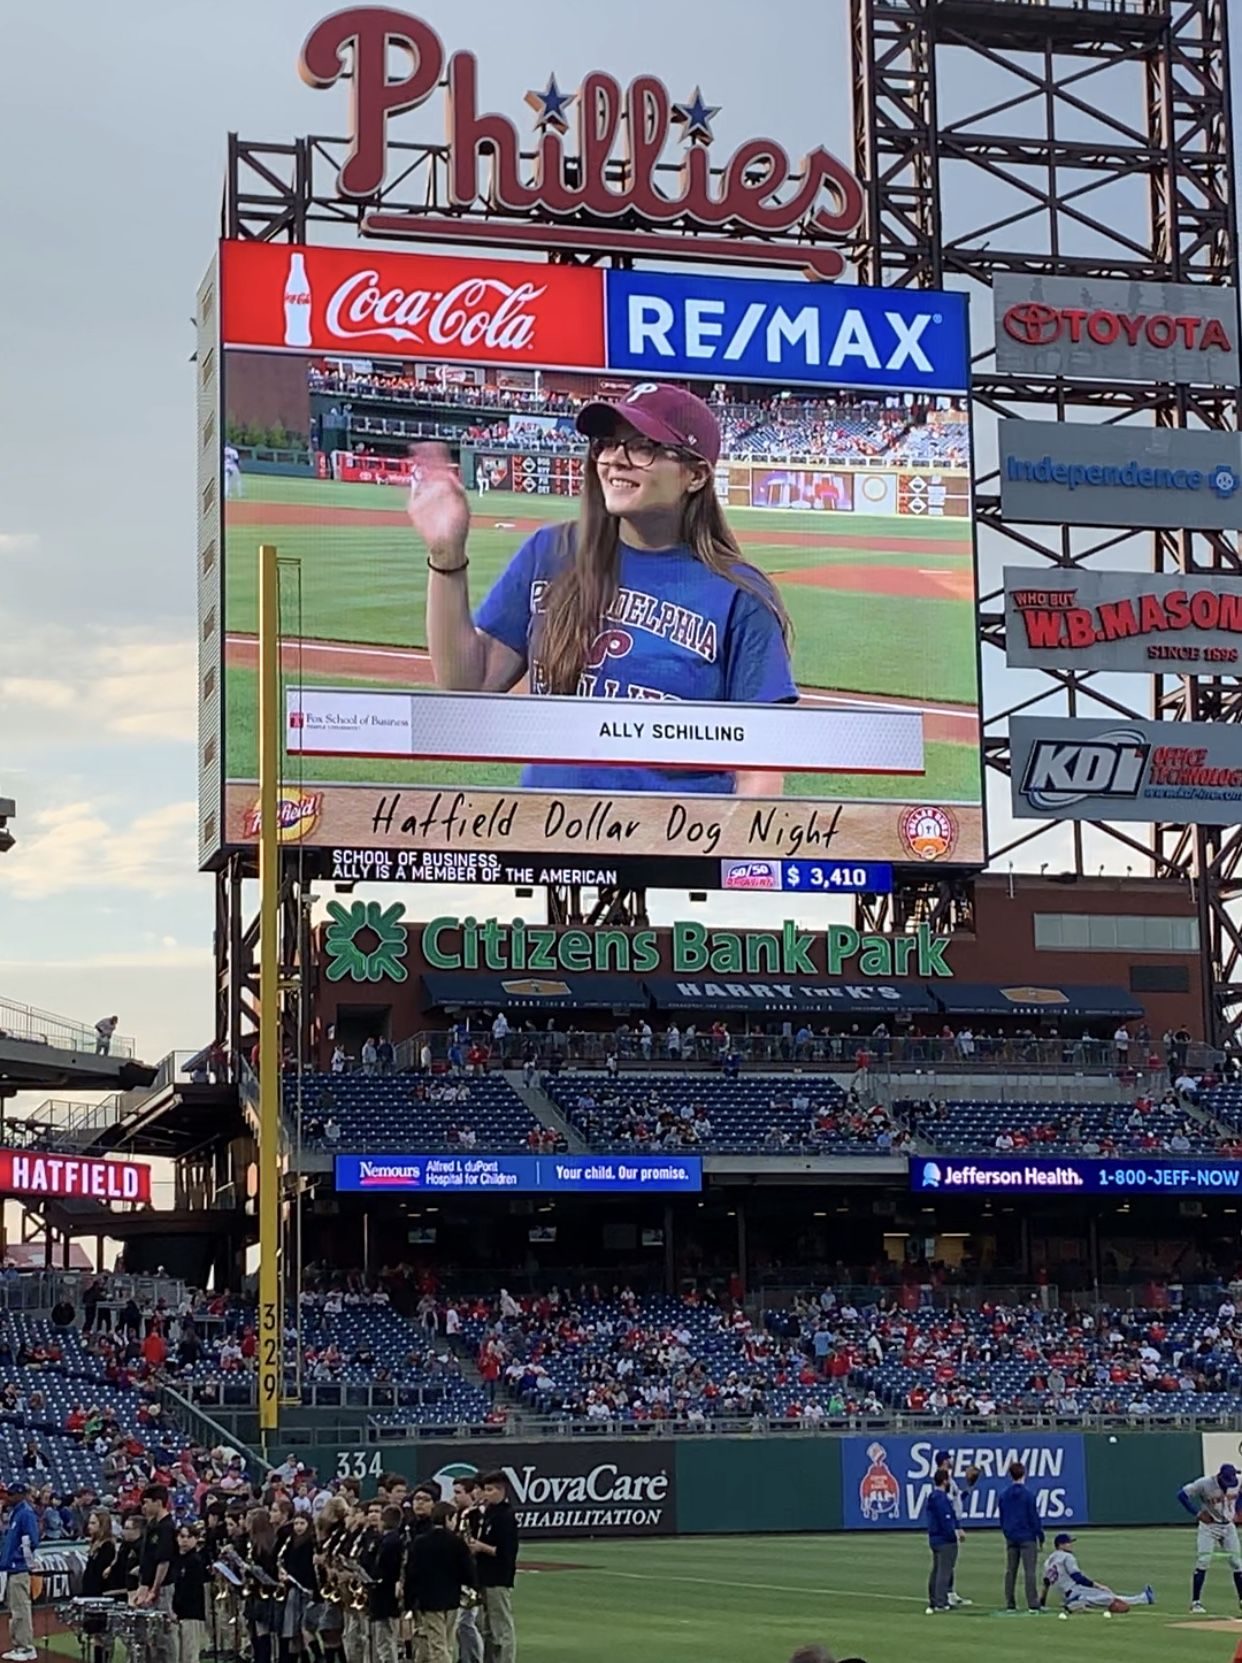 Fox student on Phillies video board